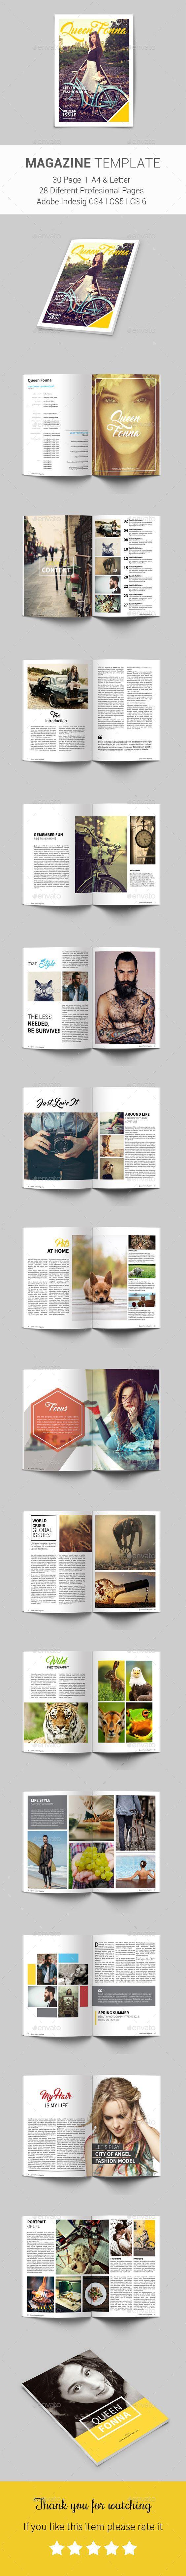 Multipurpose Magazine — InDesign INDD #hipster magazine #minimilist indesign template • Download ➝ https://graphicriver.net/item/multipurpose-magazine/19014303?ref=pxcr: